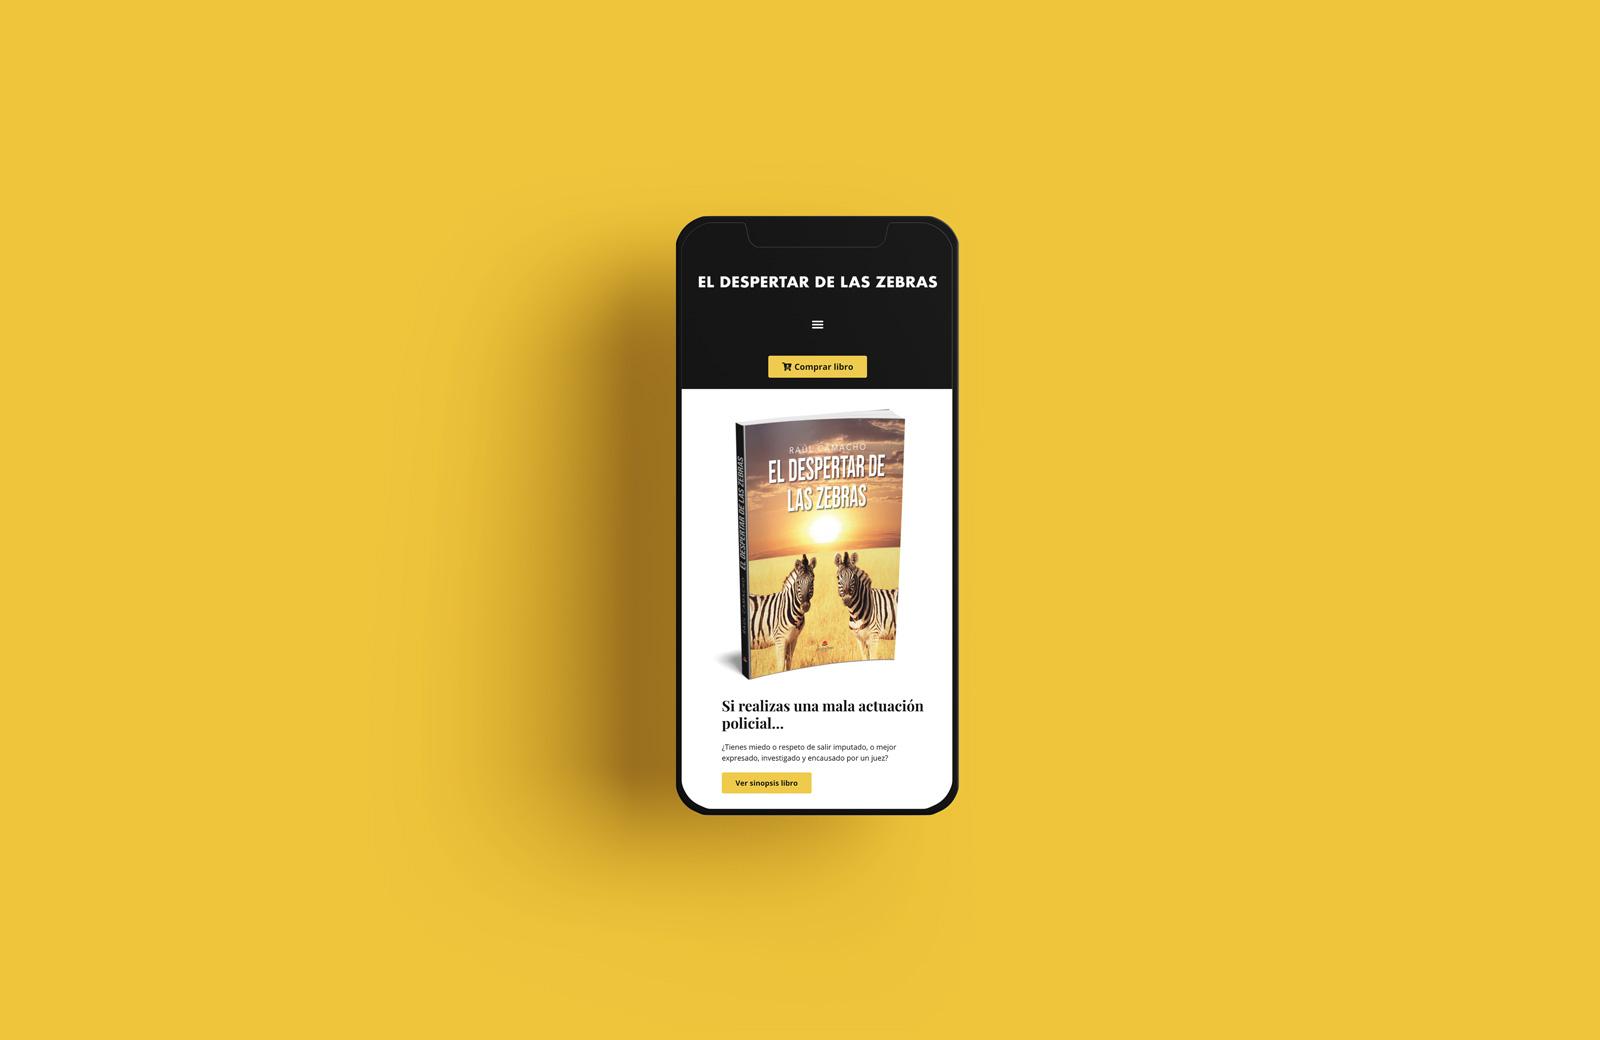 diseño-de-pagina-web-responsive